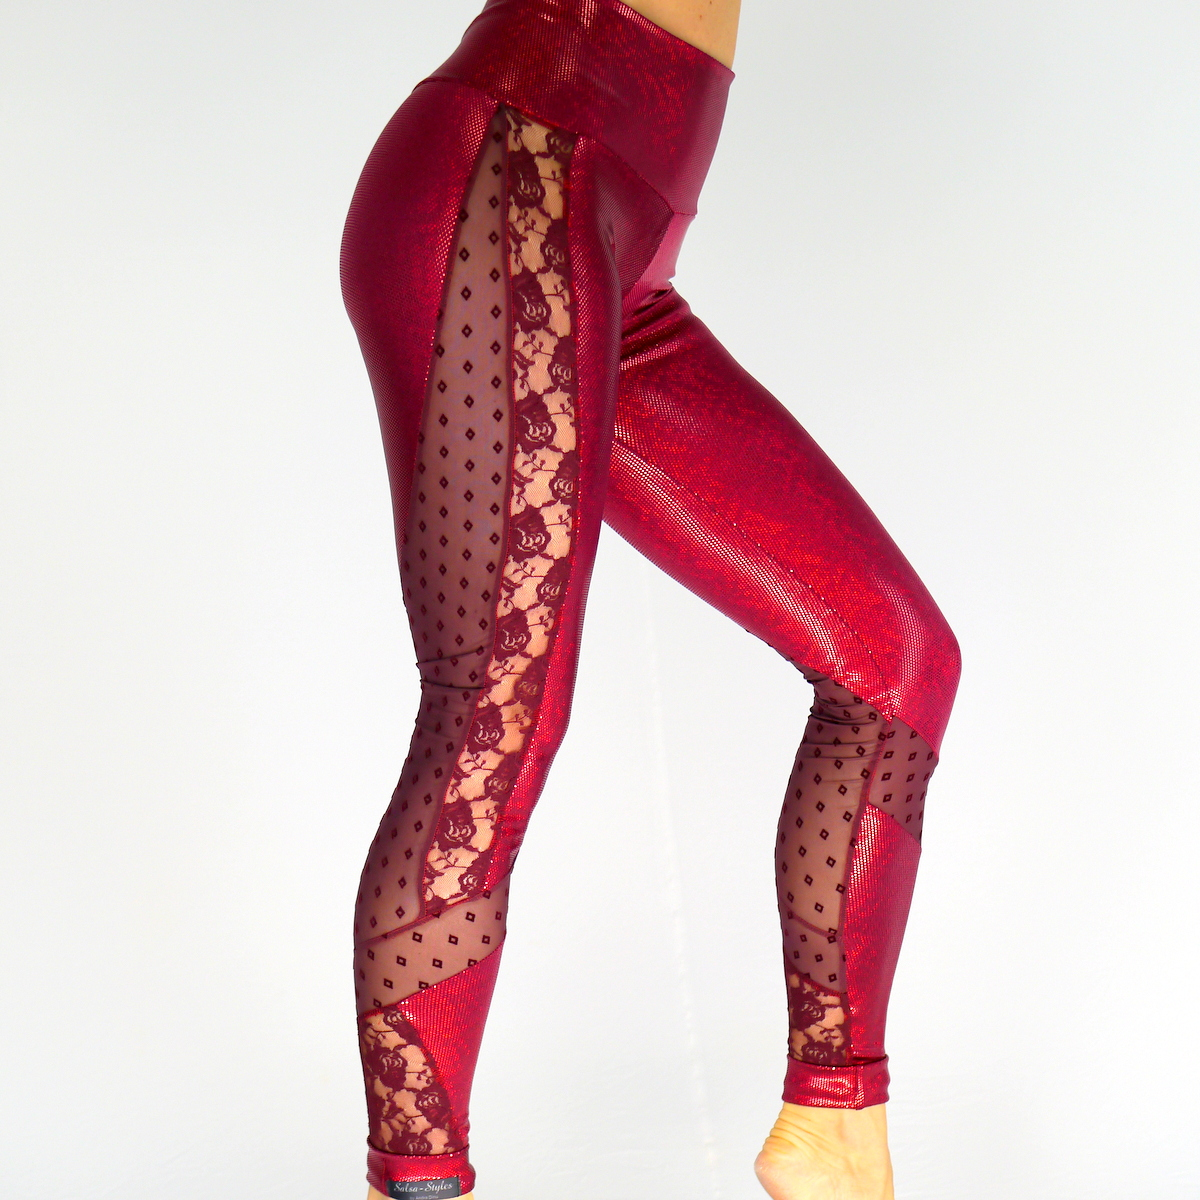 leggings sarah bunte leggings leggings salsa styles. Black Bedroom Furniture Sets. Home Design Ideas